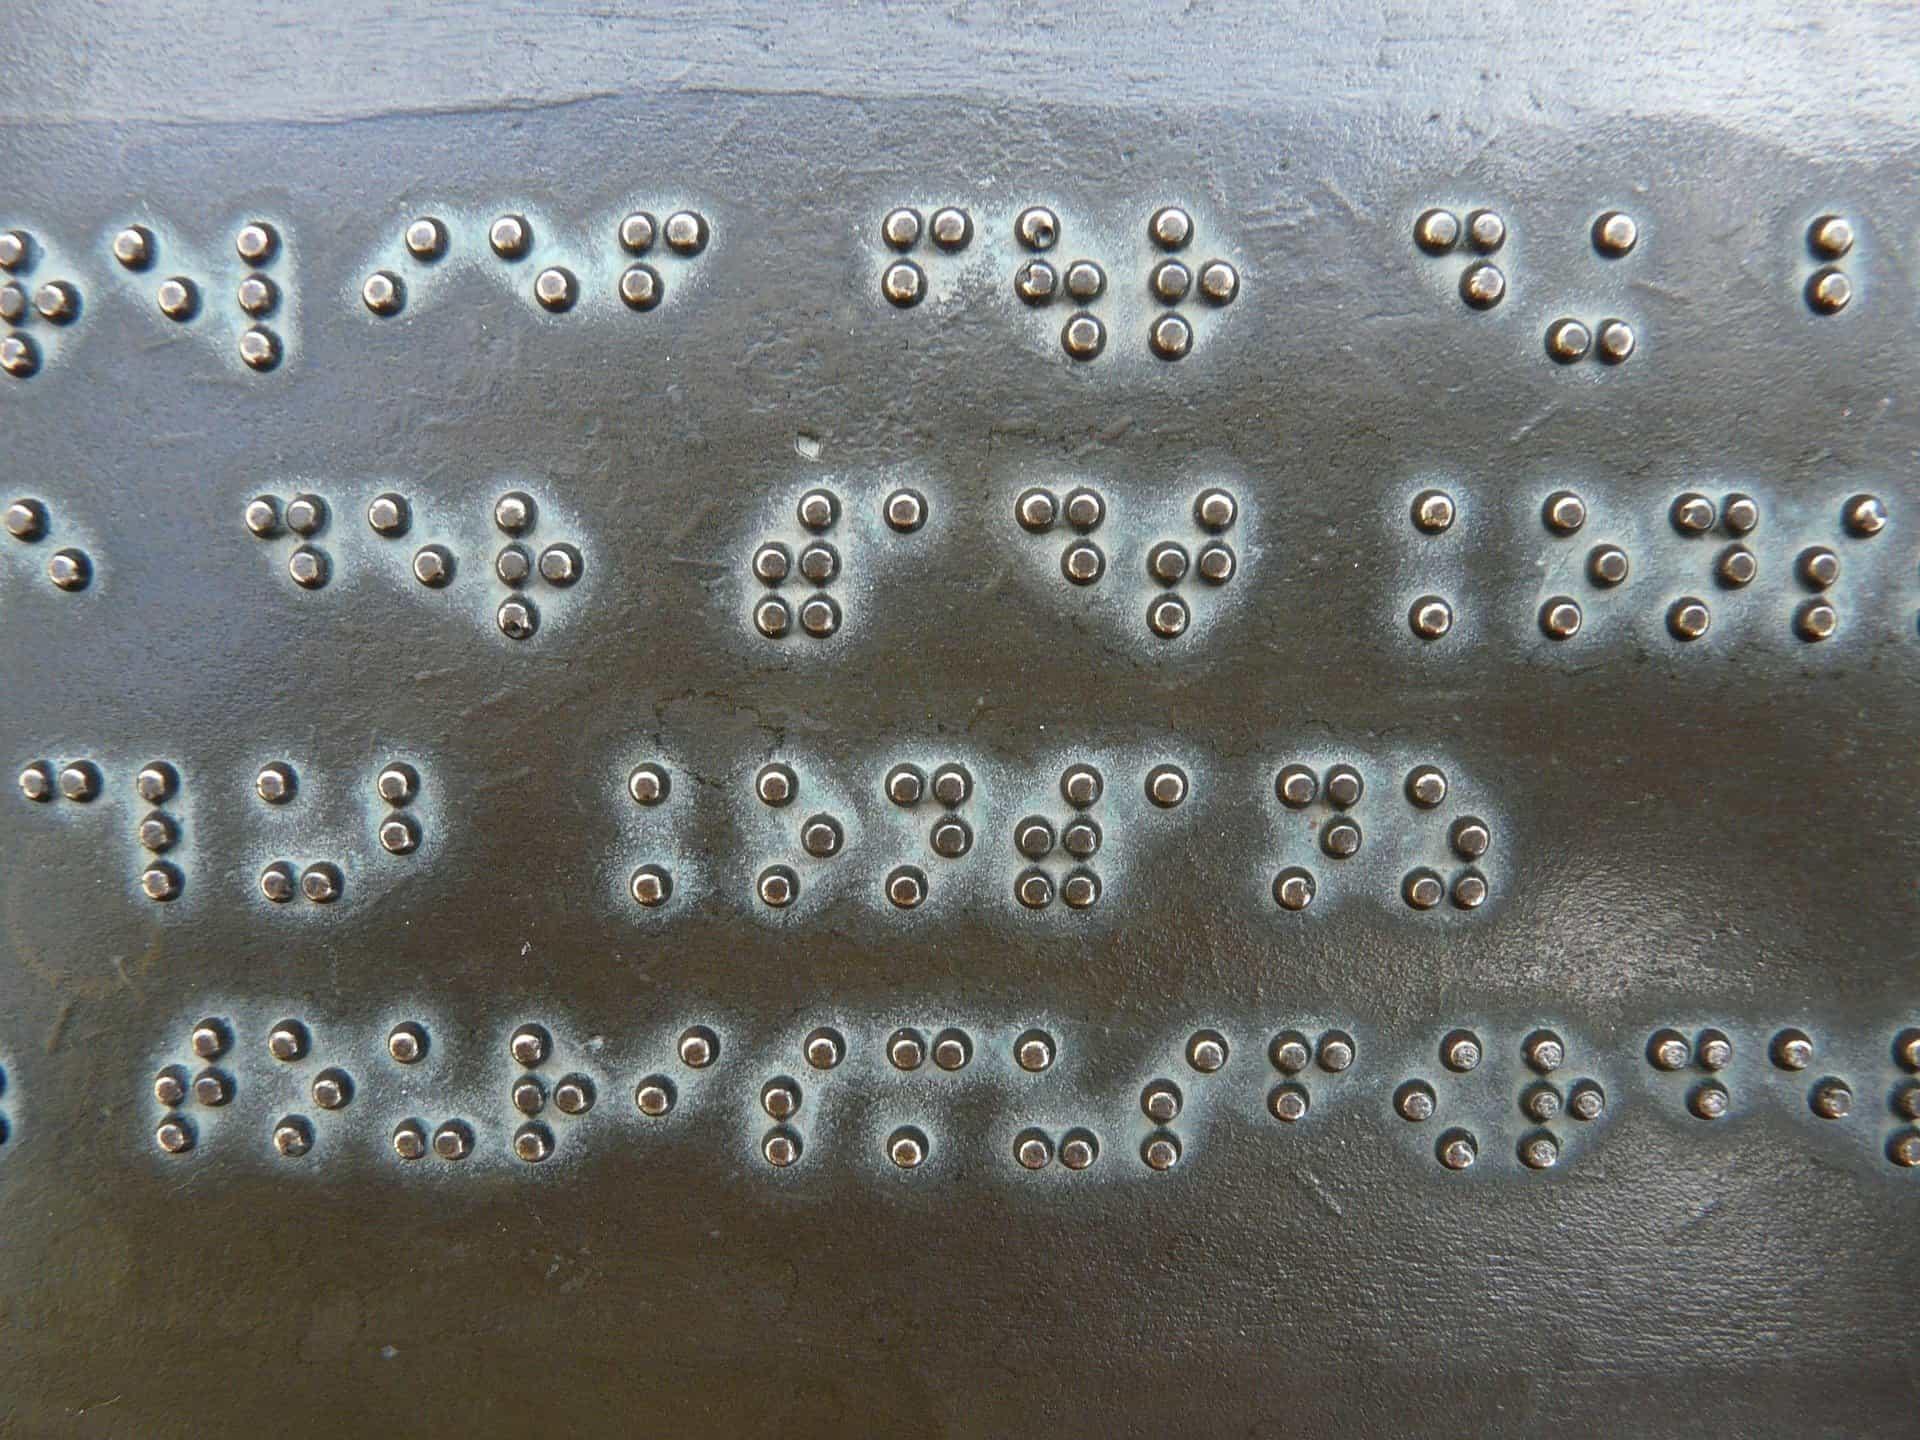 braille acoso escolar 4 educacion inclusiva y altruismo i221105